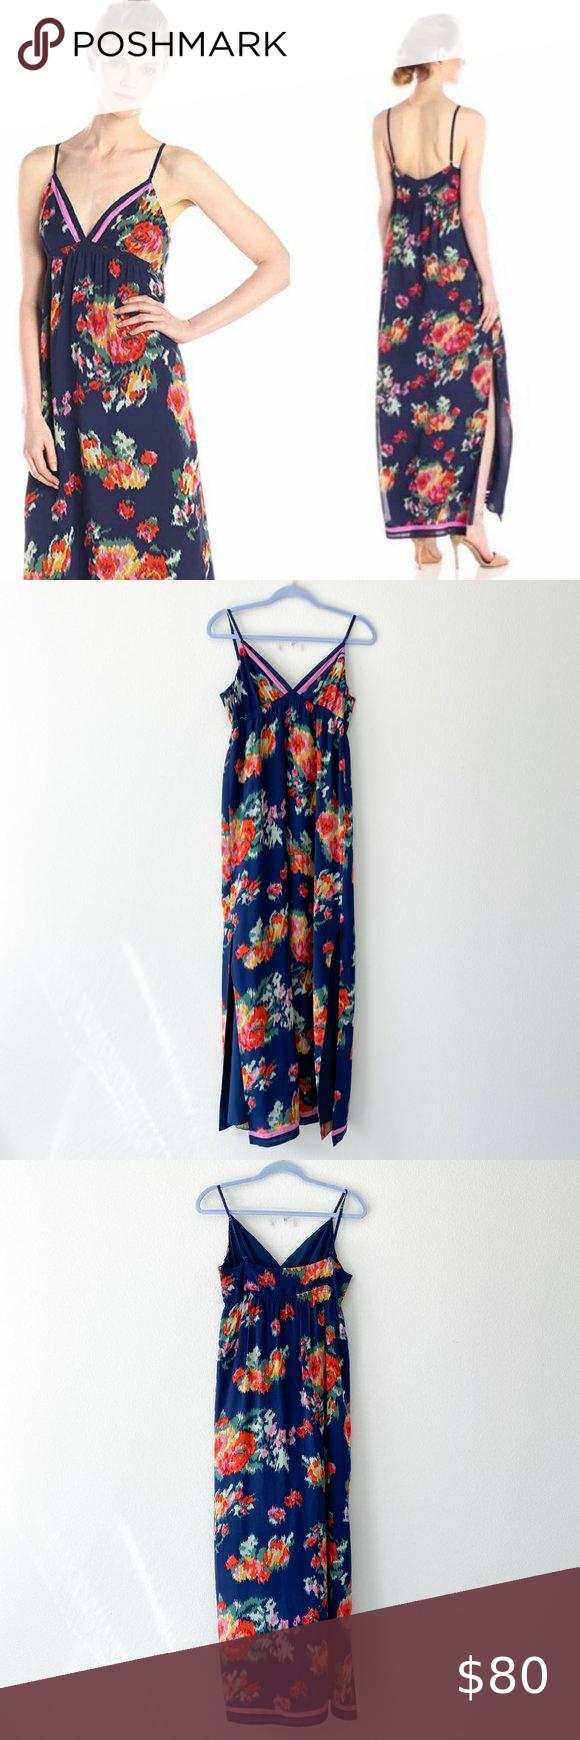 Joie Sherita Maxi Floral 100 Silk Summer Dress In 2020 Silk Summer Dress Vacation Maxi Dress Summer Dresses